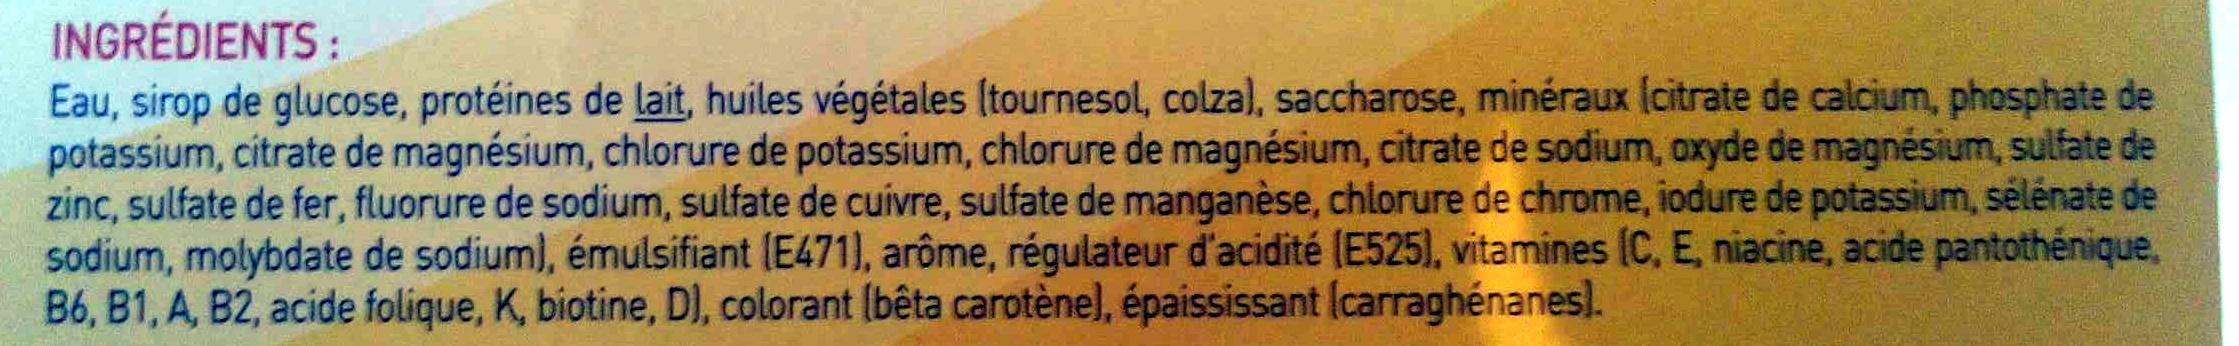 Booster saveur vanille - Ingredients - fr